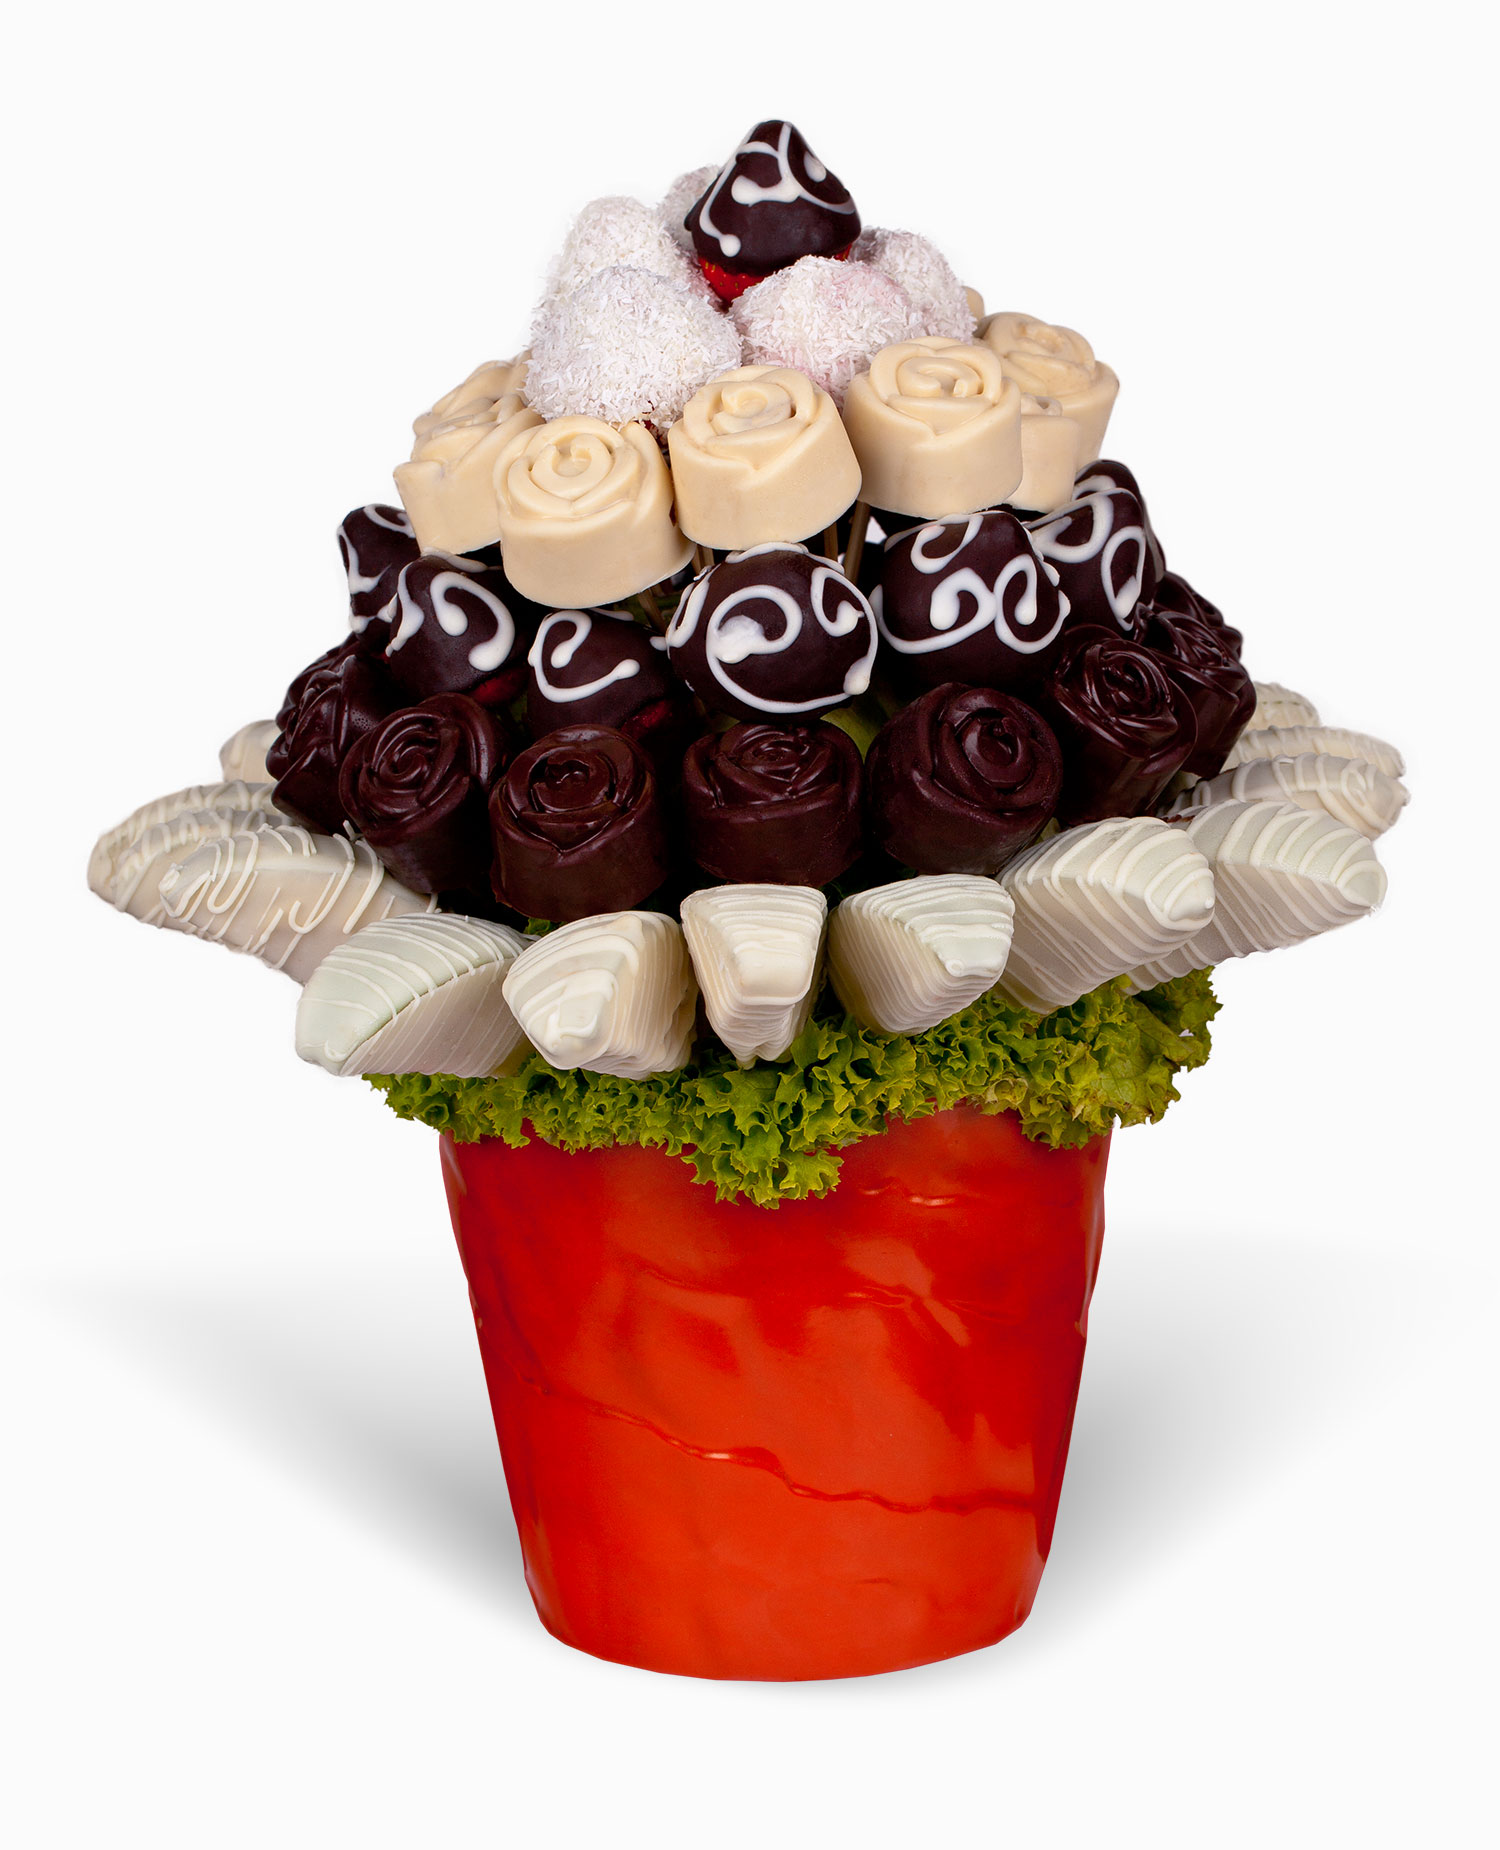 Čokoládový dezert - rozvoz, dárek